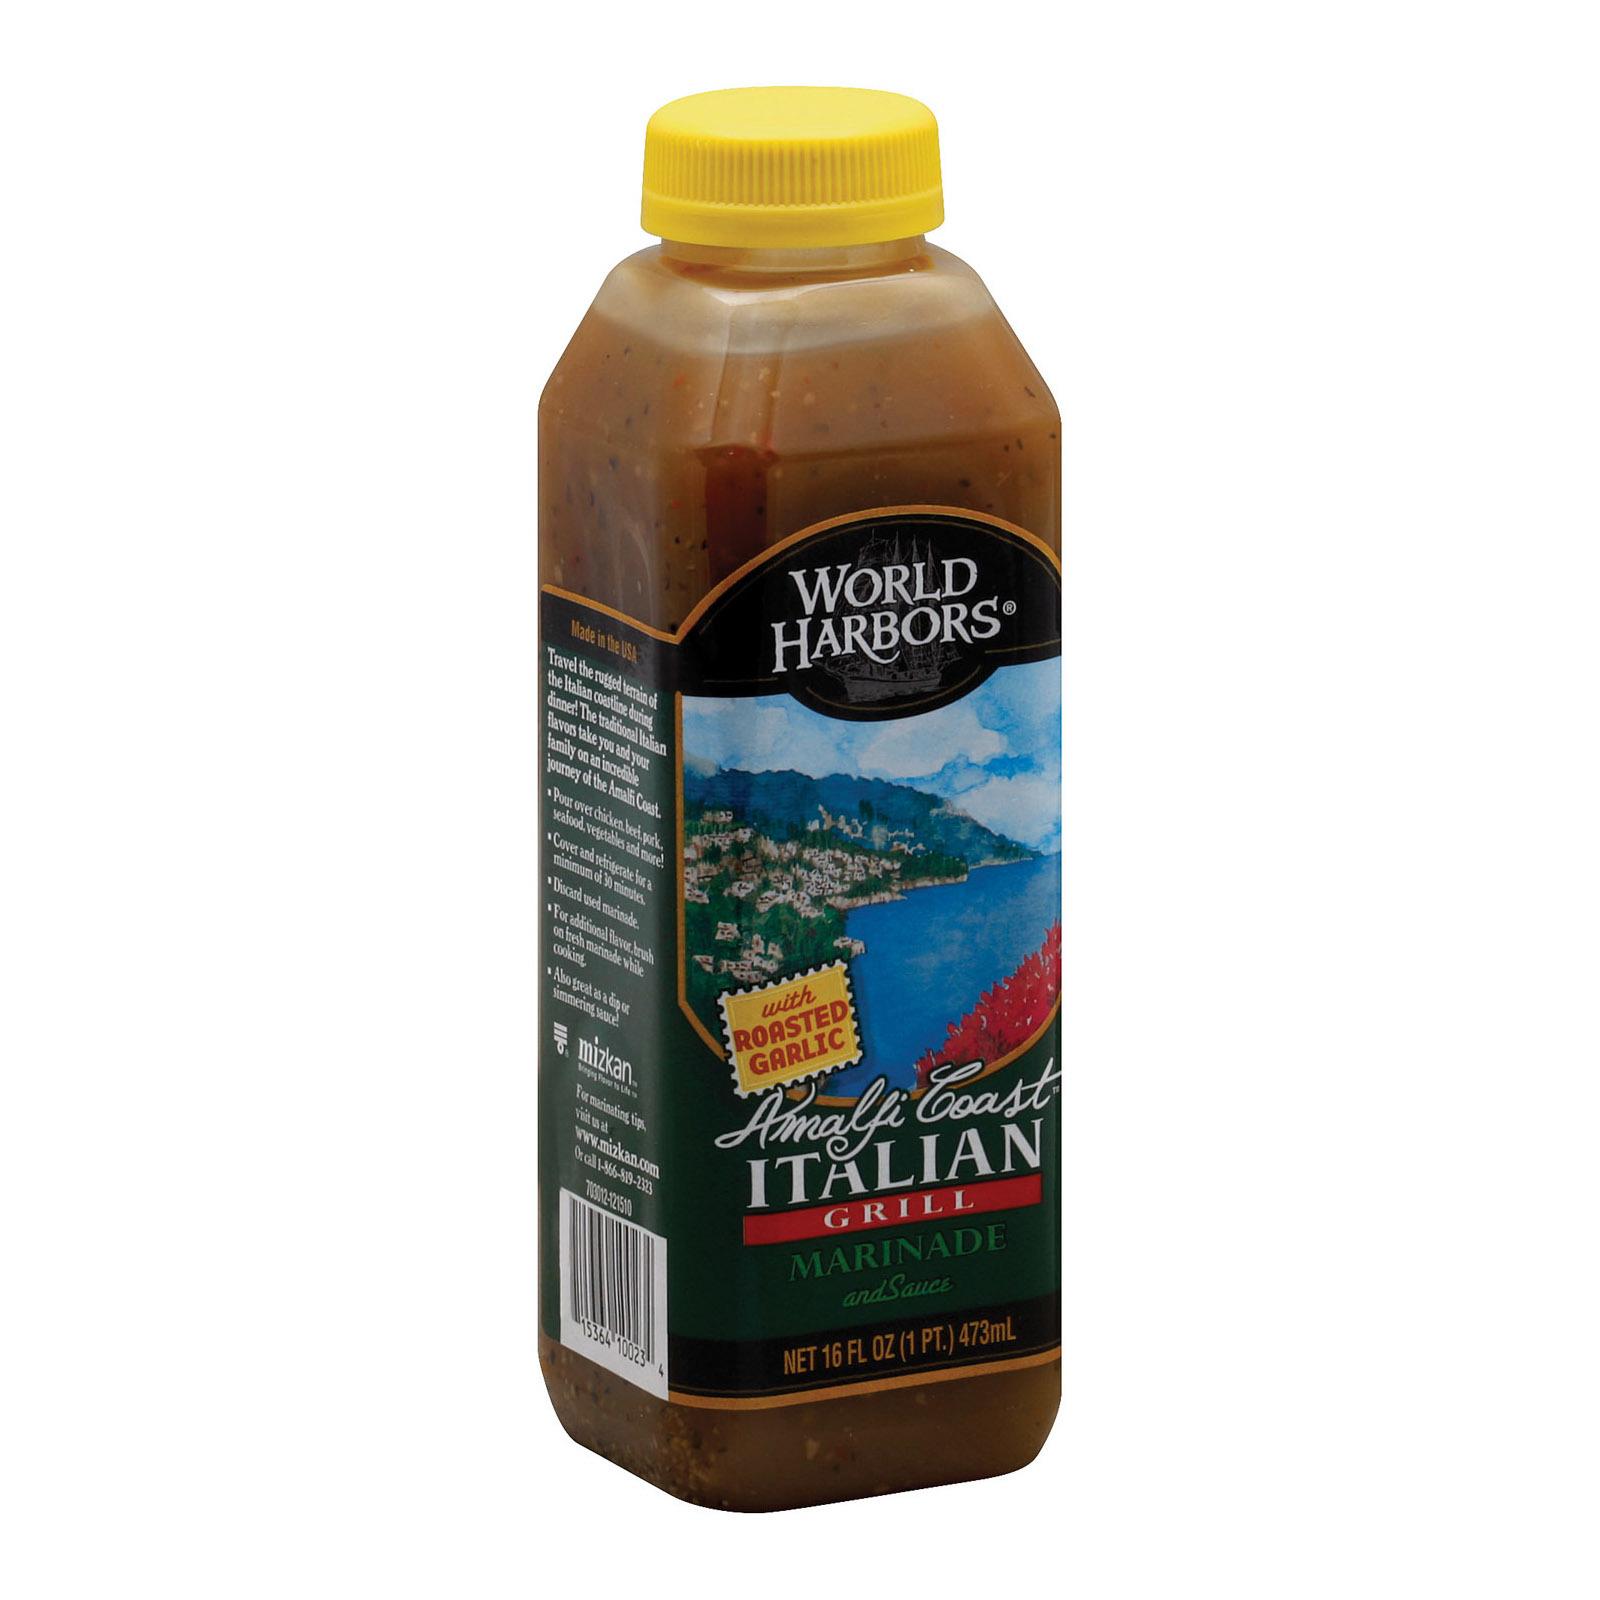 World Harbor Amalfi Coast Marinade and Sauce Italian Grill - Case of 6 - 16 Fl oz.